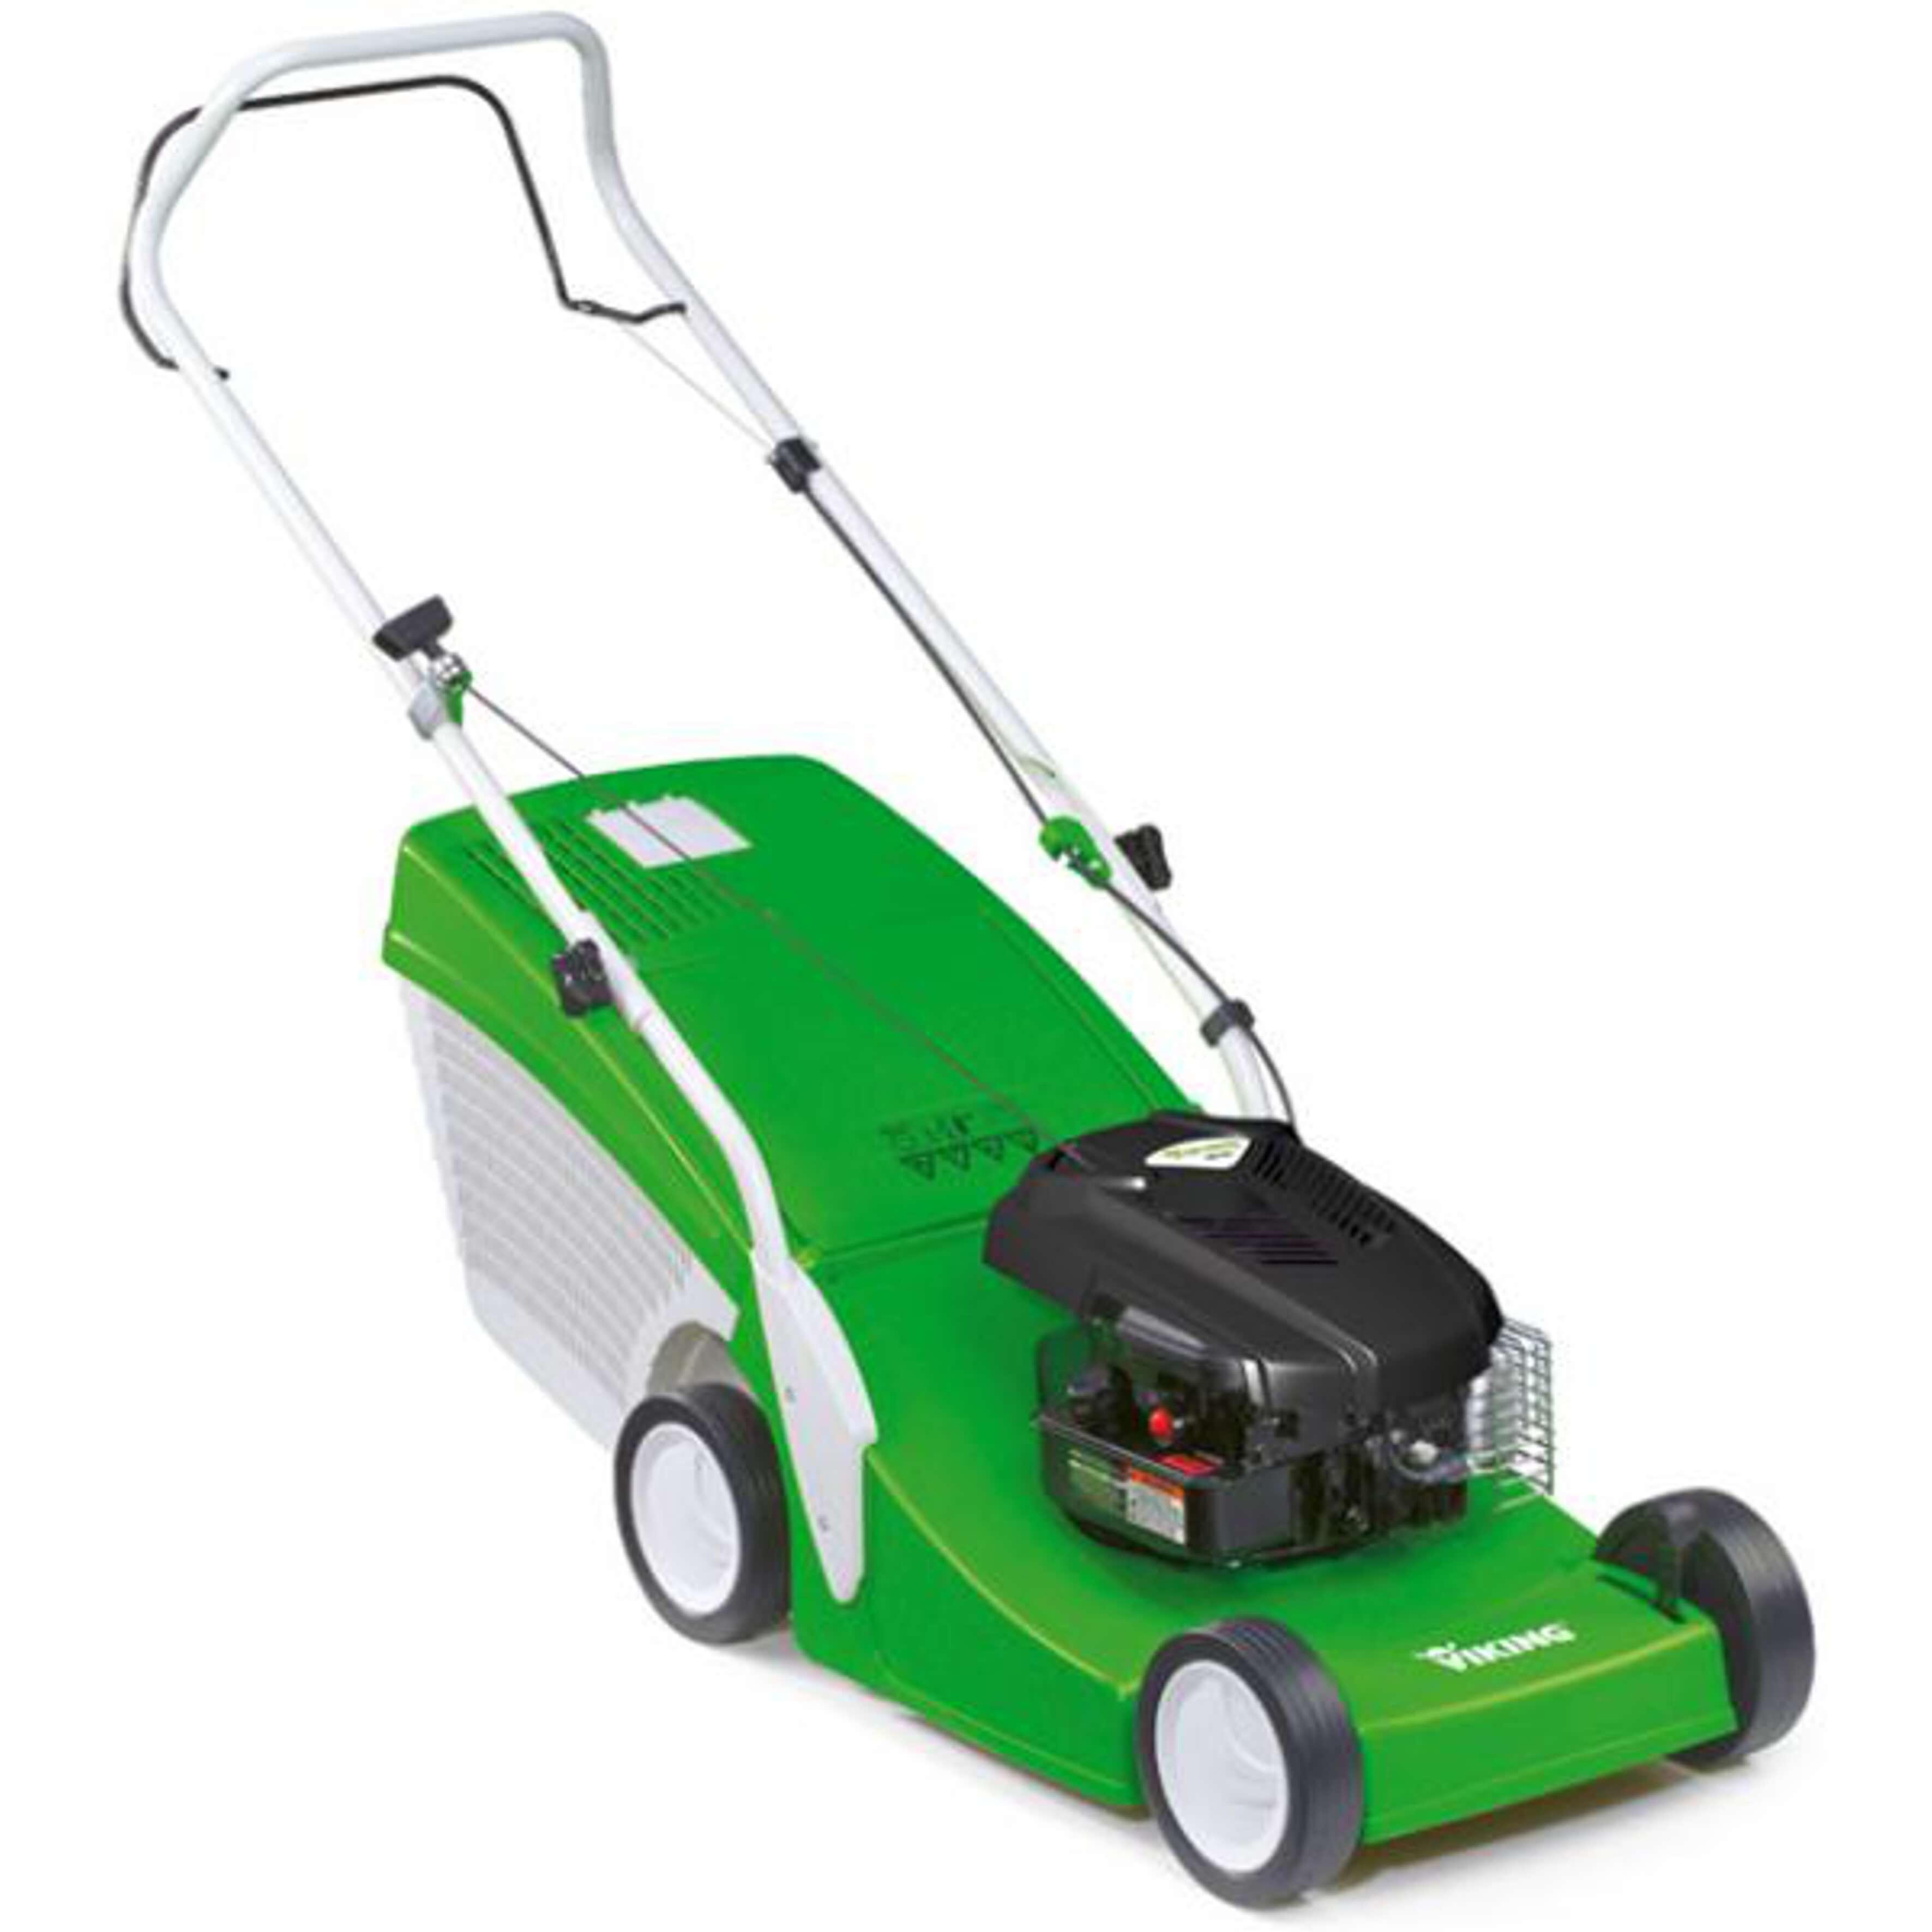 Viking 4 Series Petrol Lawn Mowers